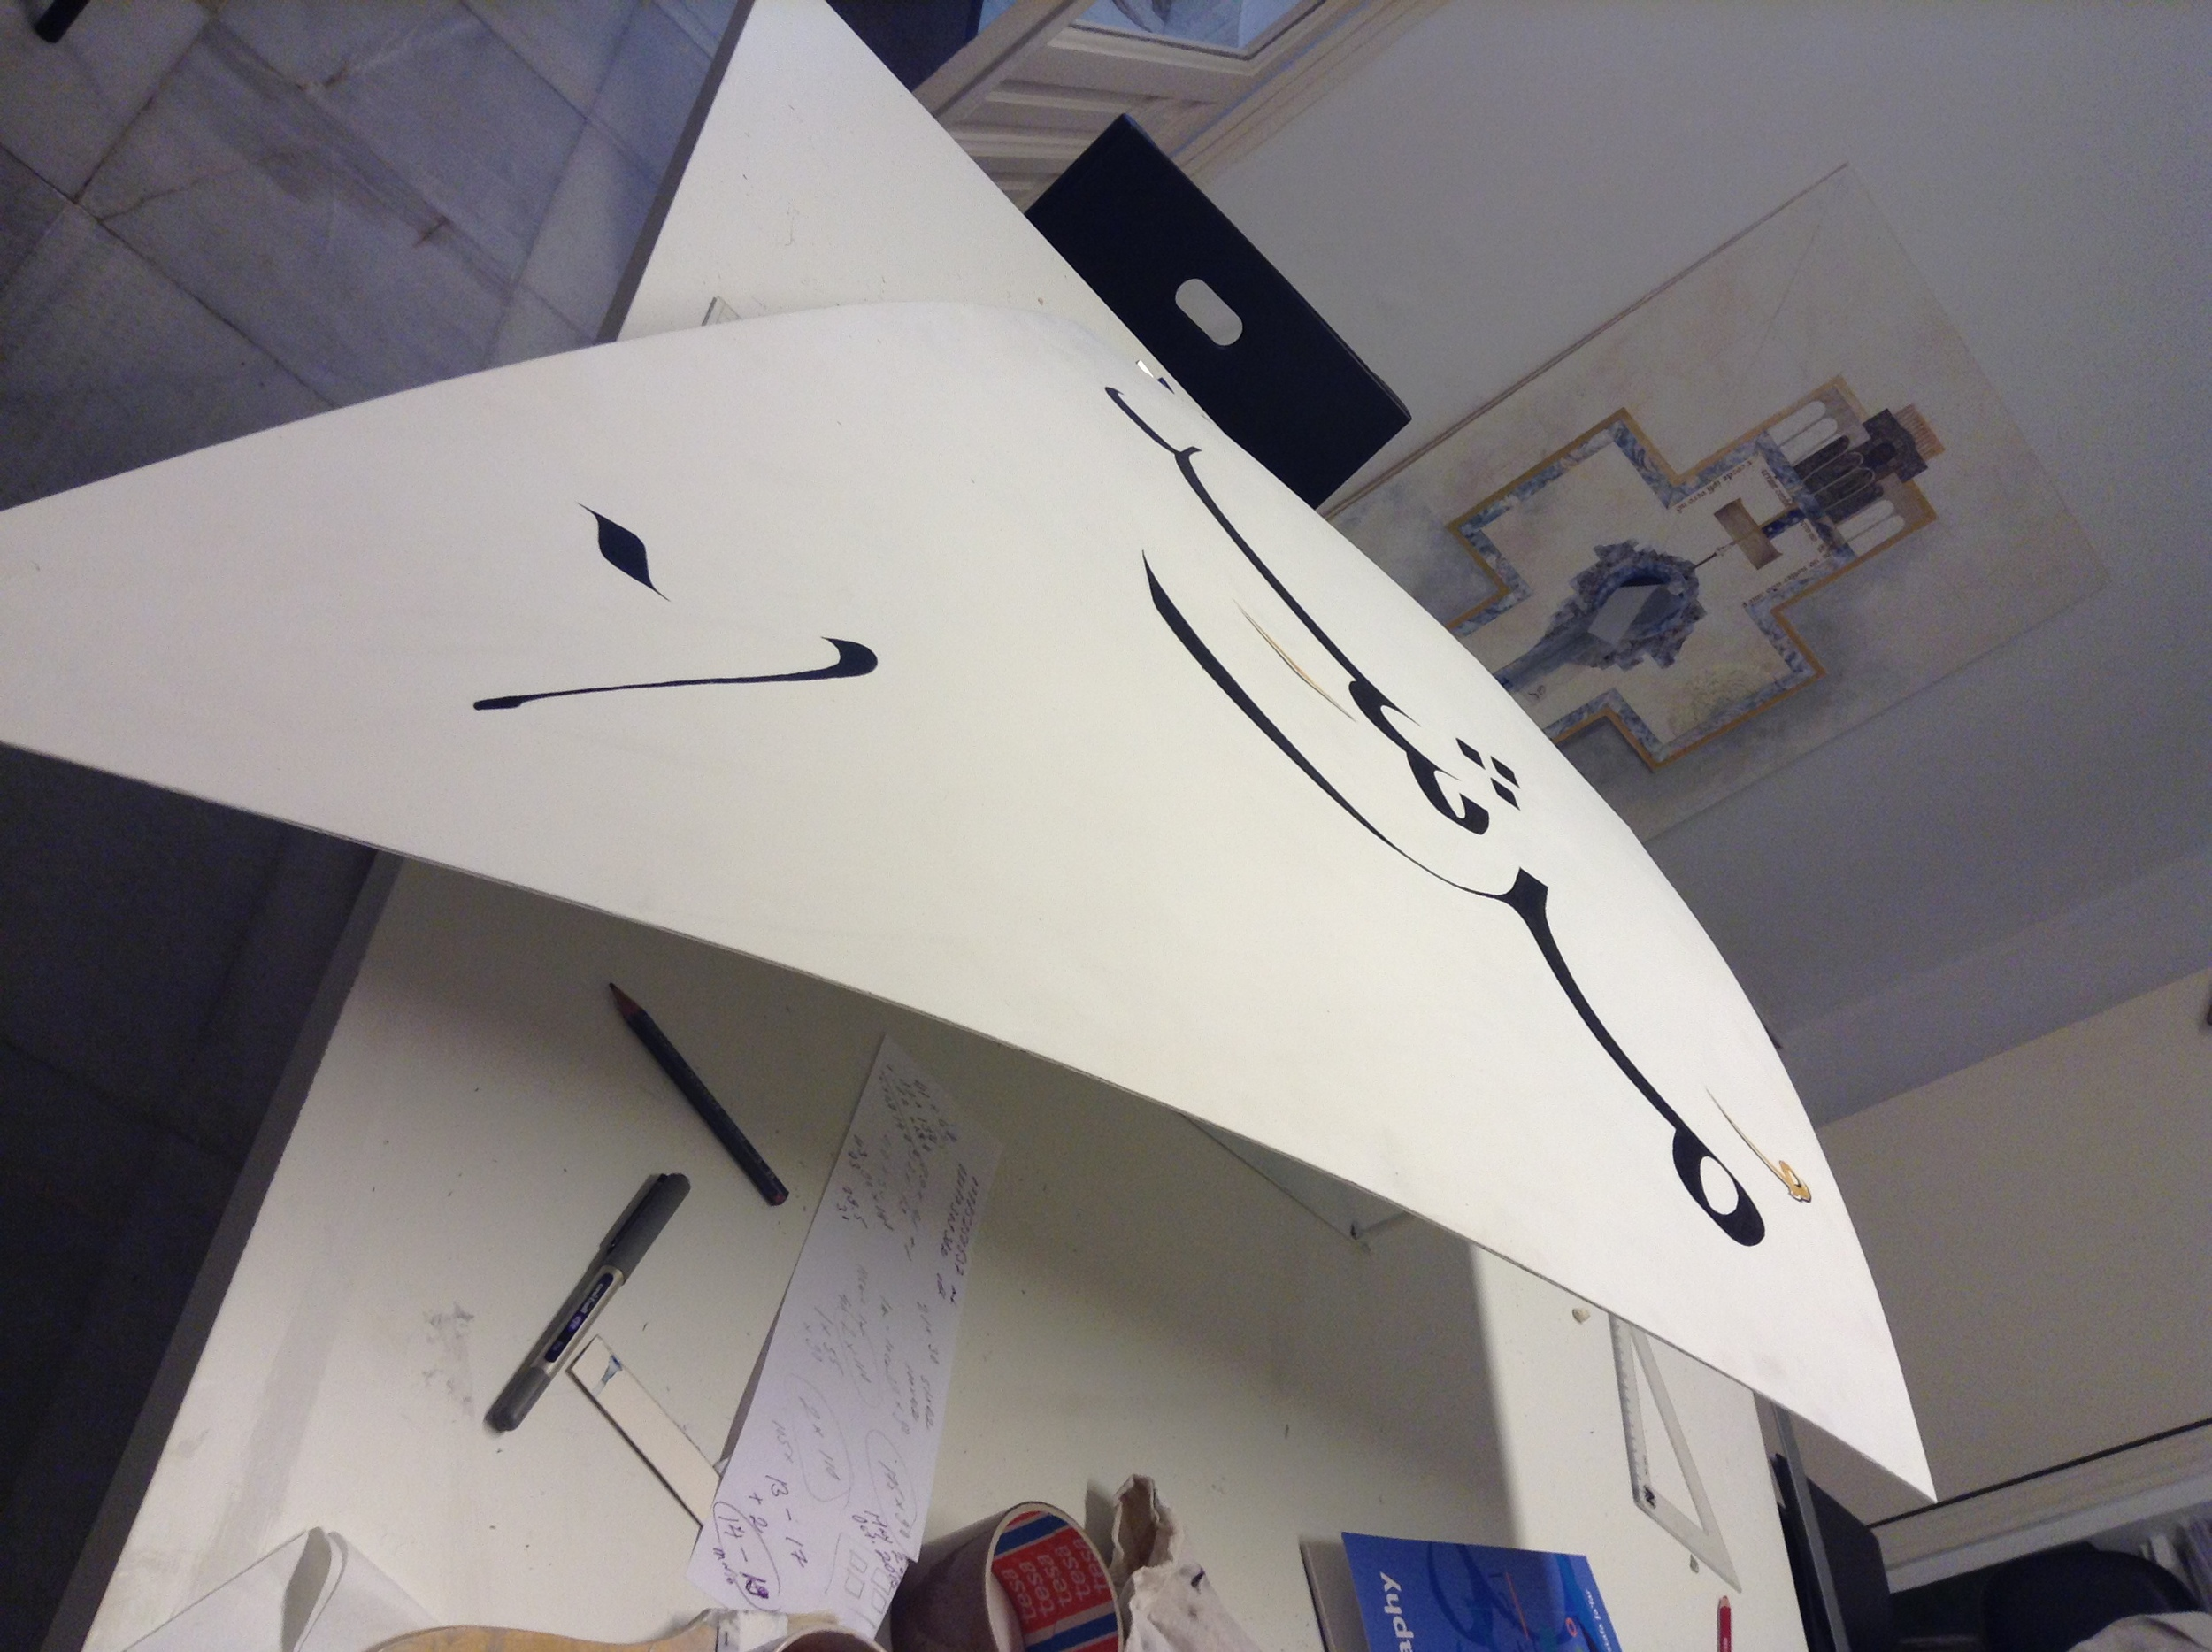 Kites Construction 003.JPG